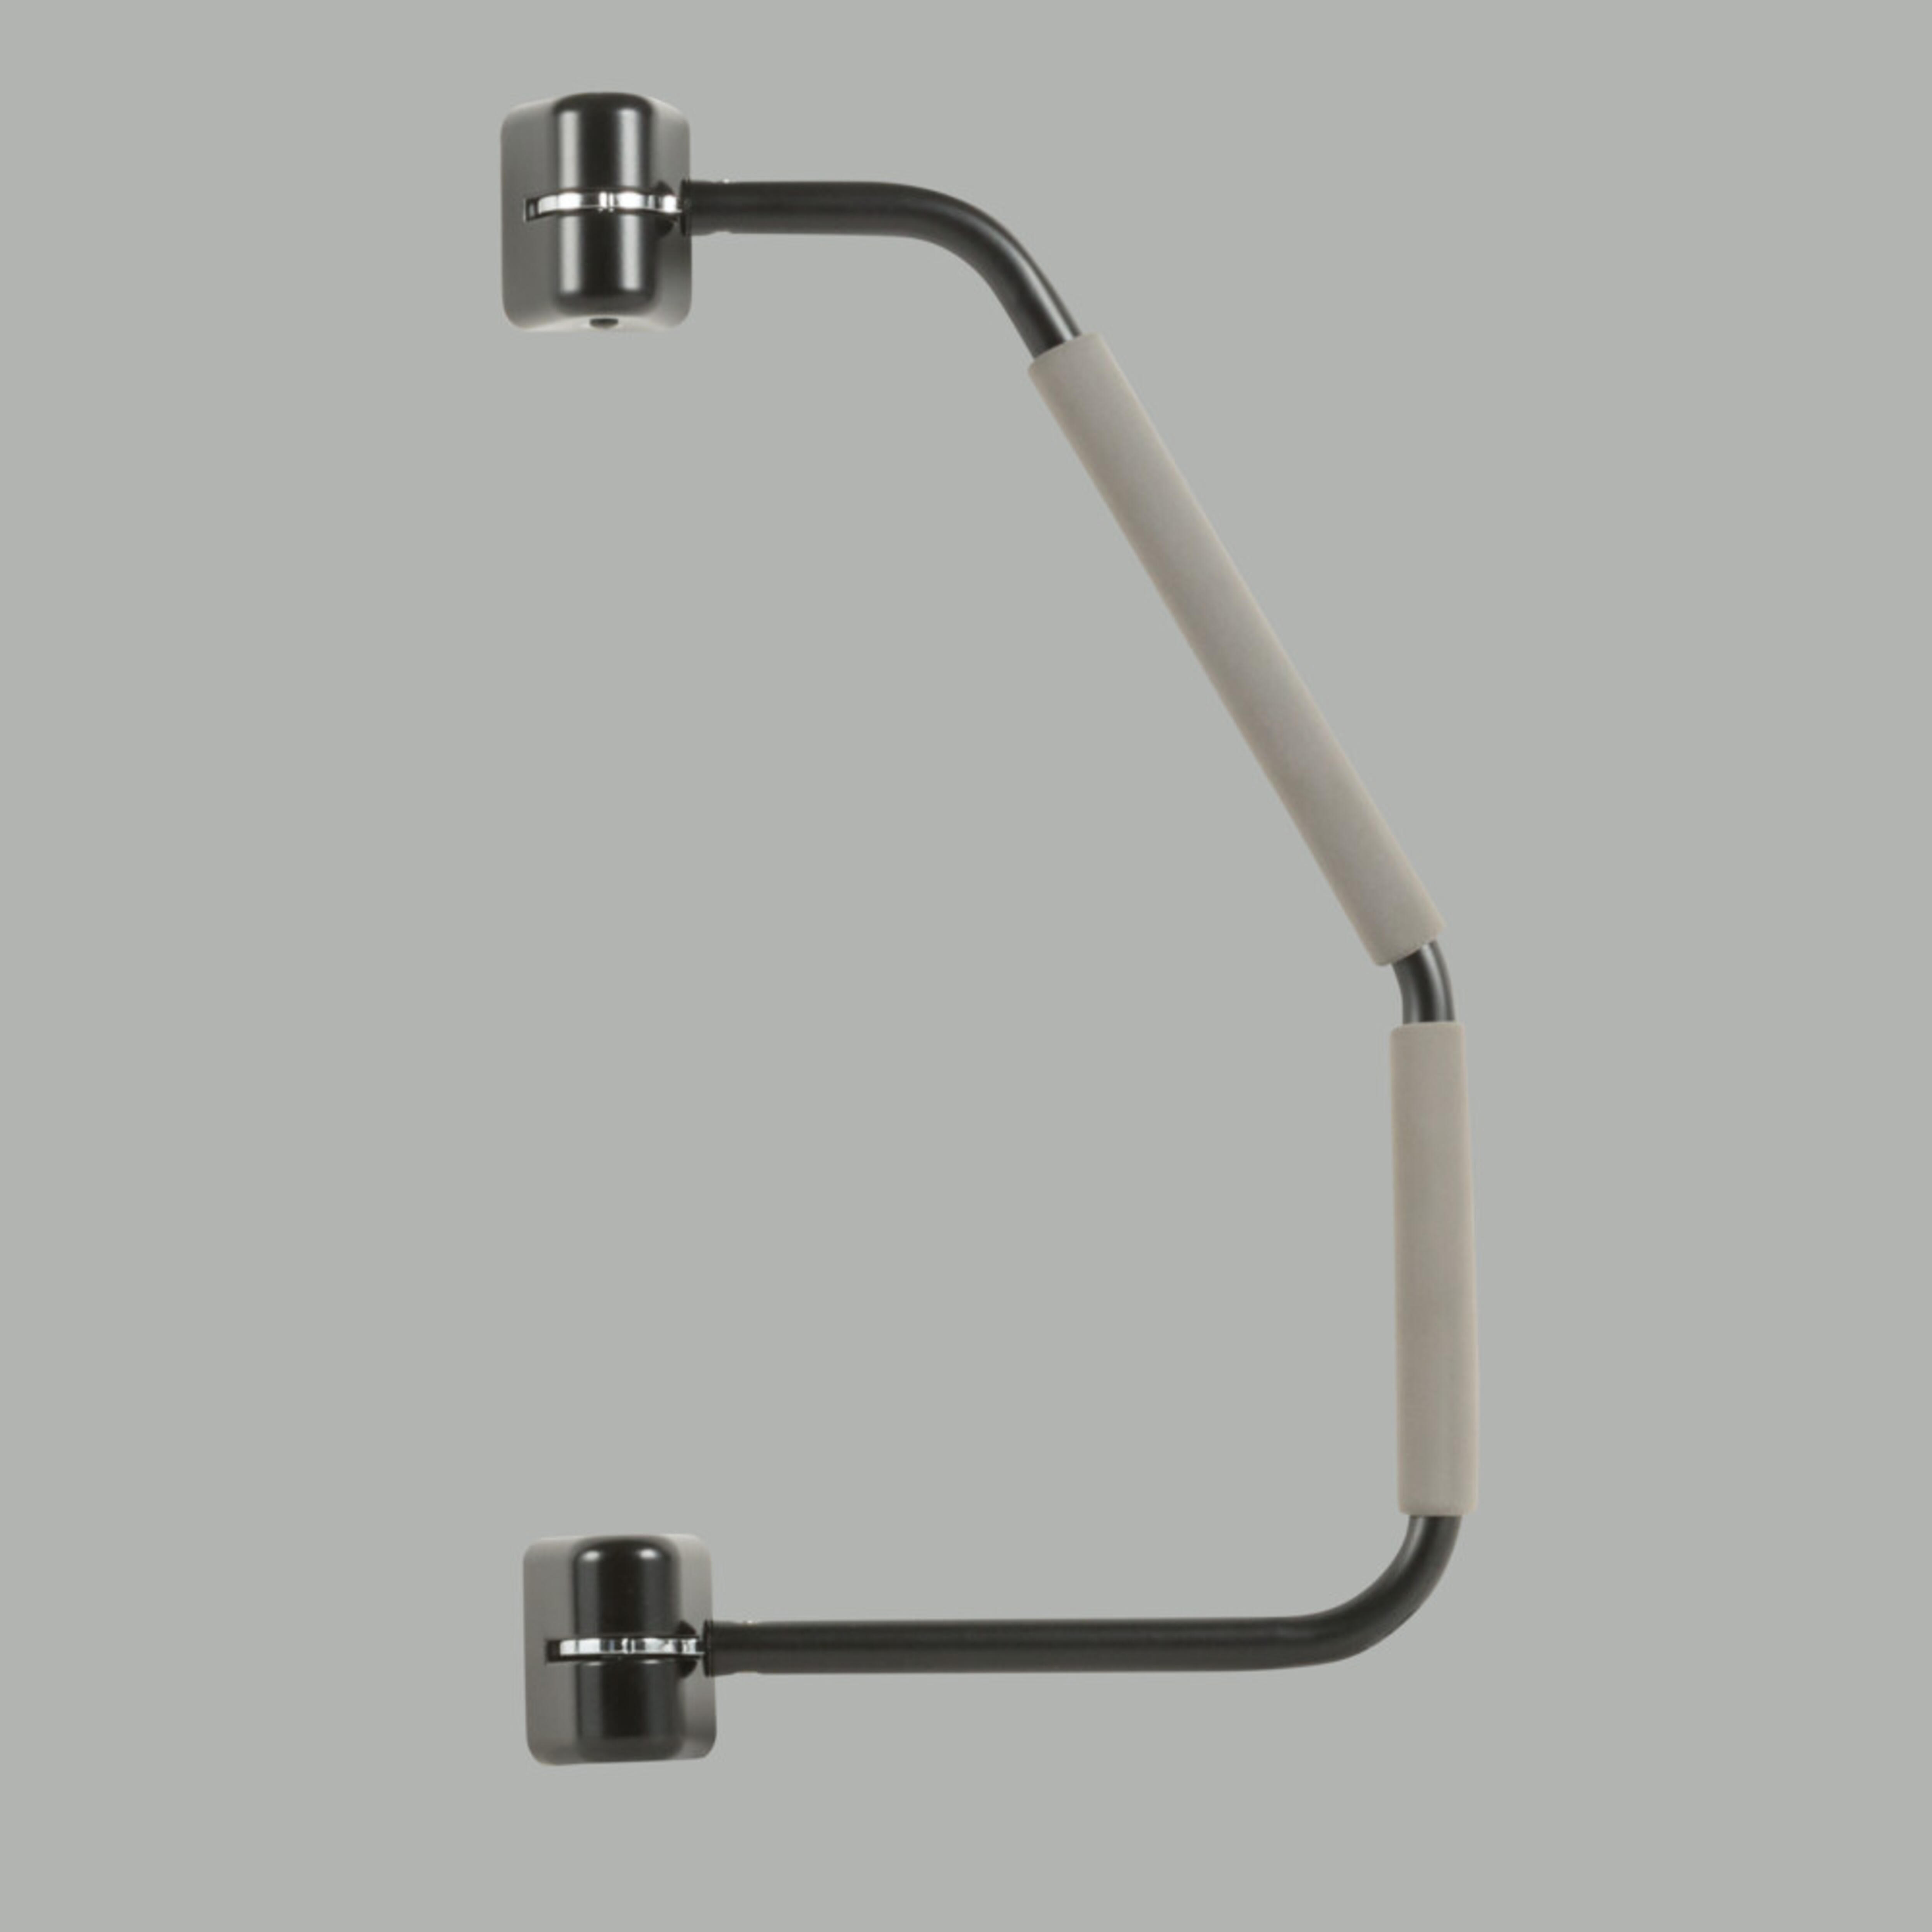 Dometic Milenco Locking Handrail